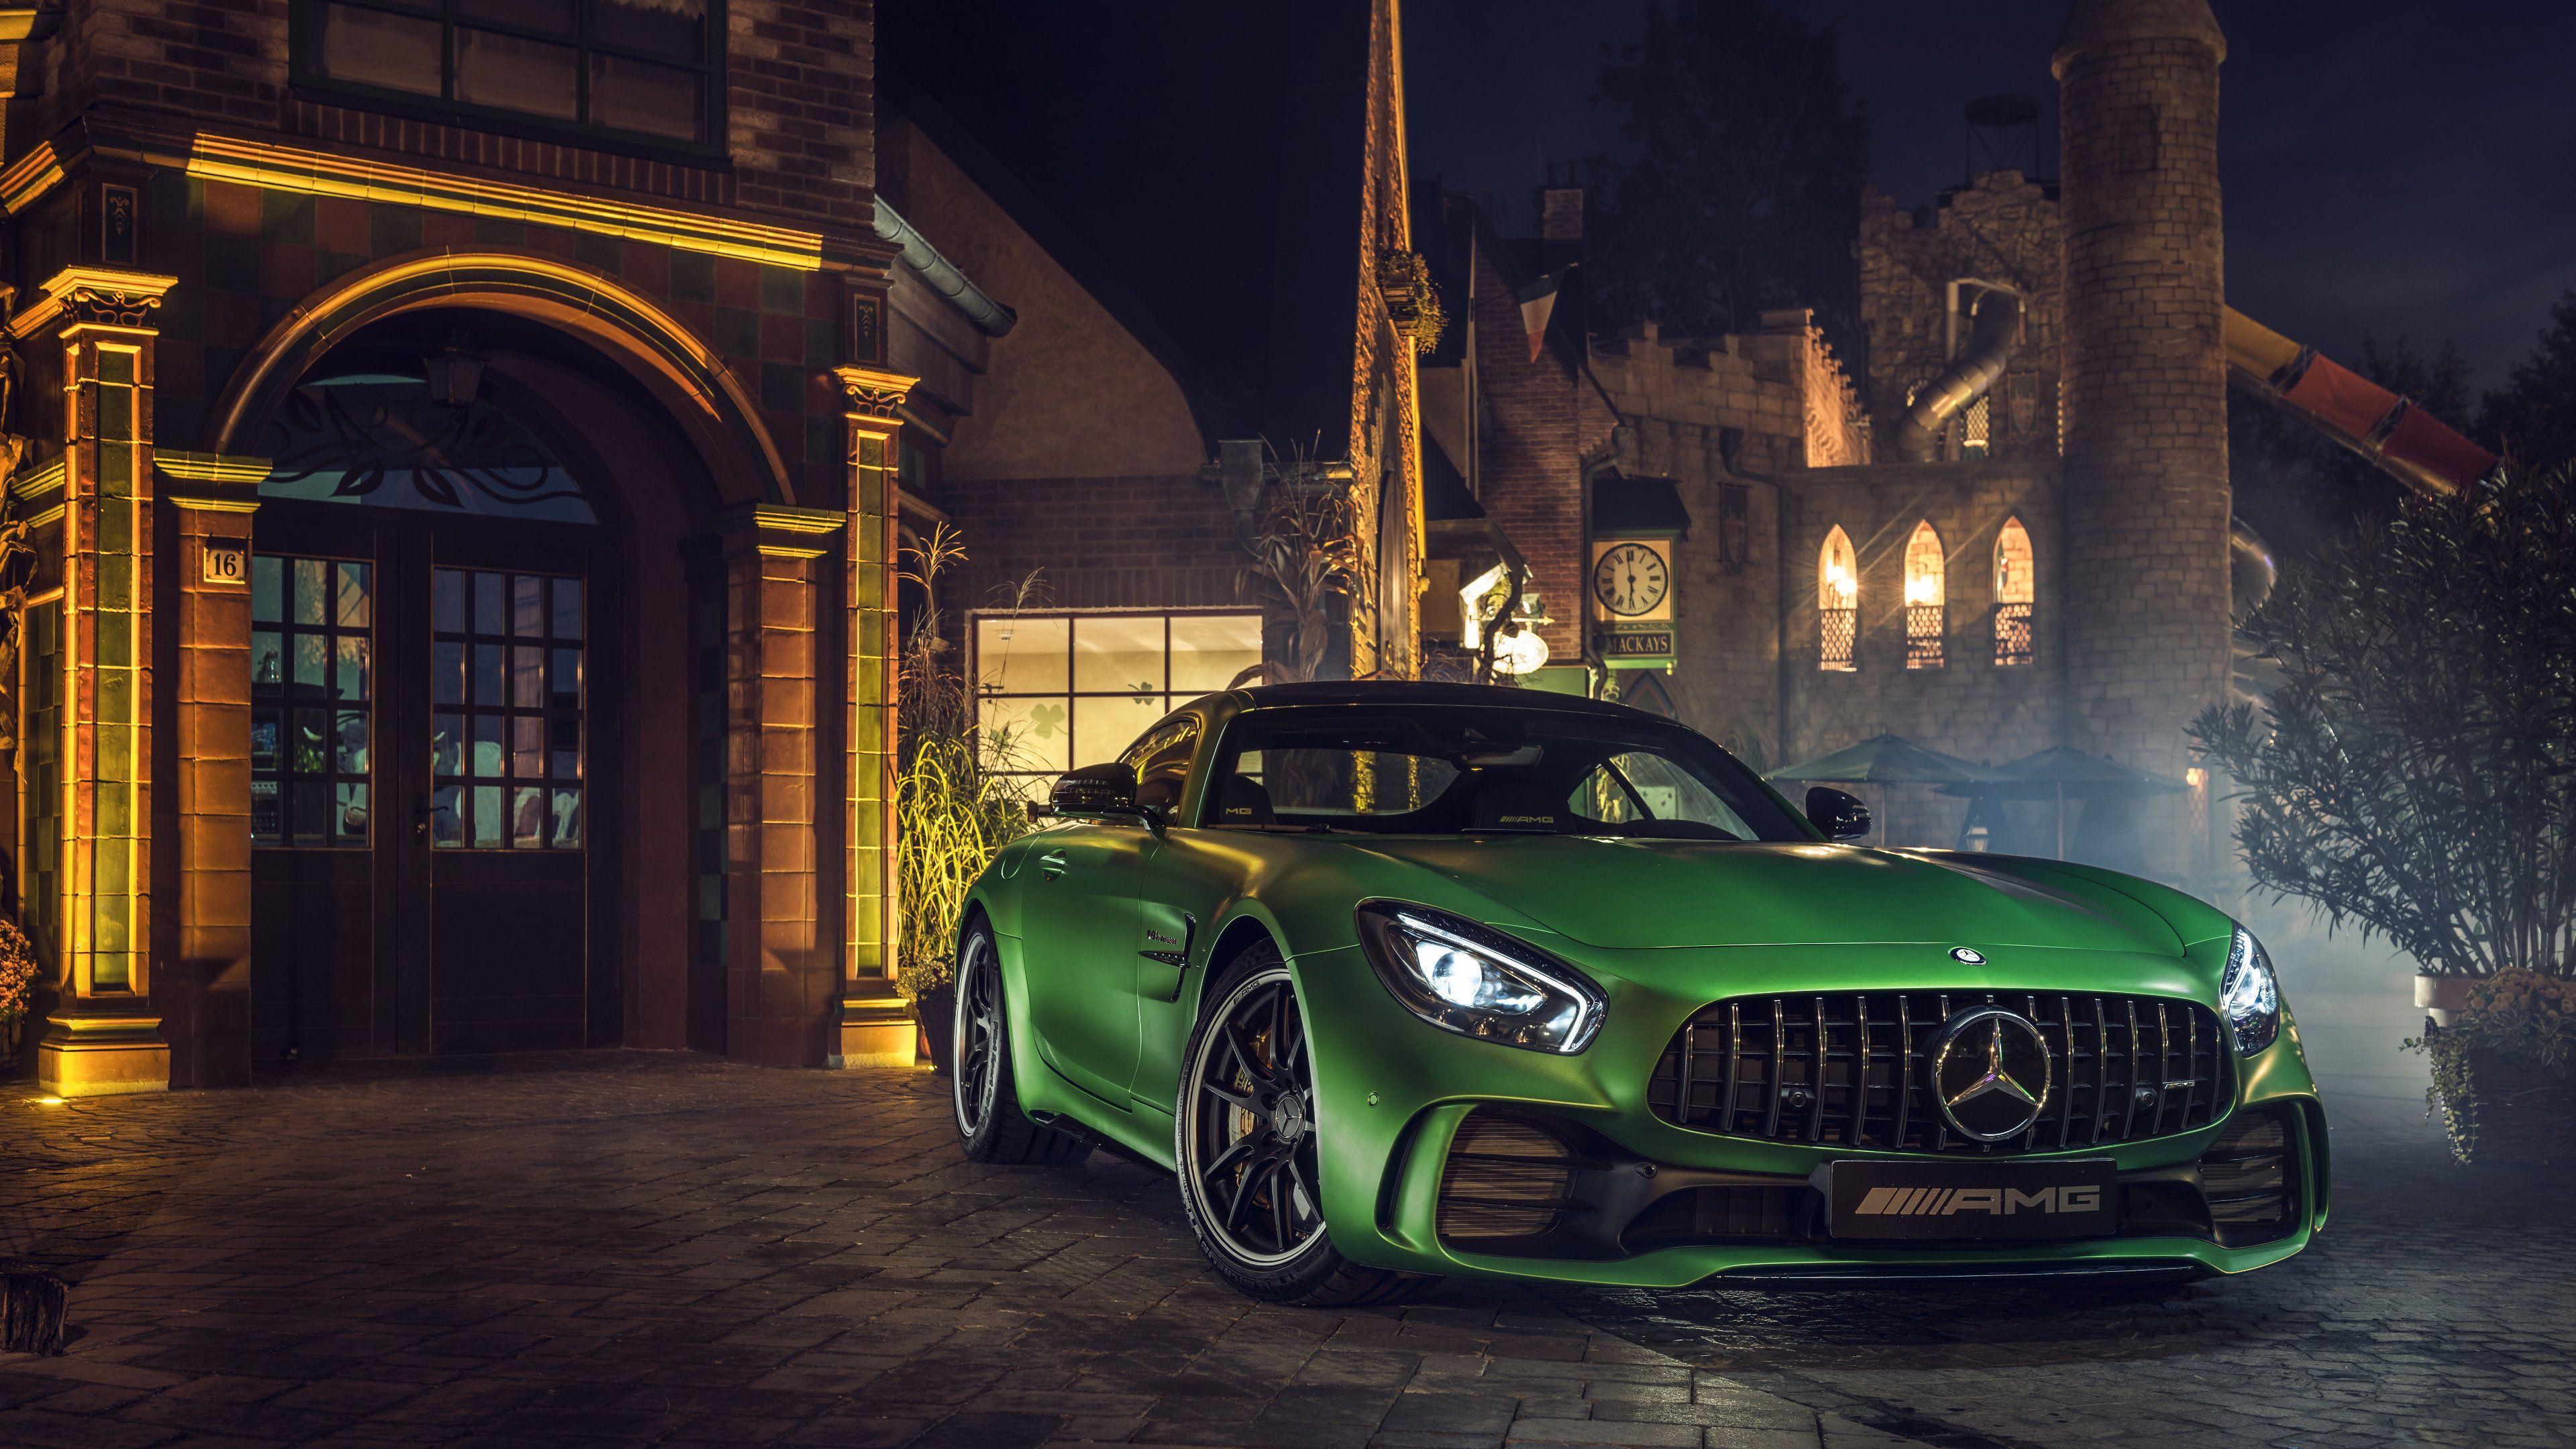 Mercedes-AMG GT R Wallpapers - Wallpaper Cave